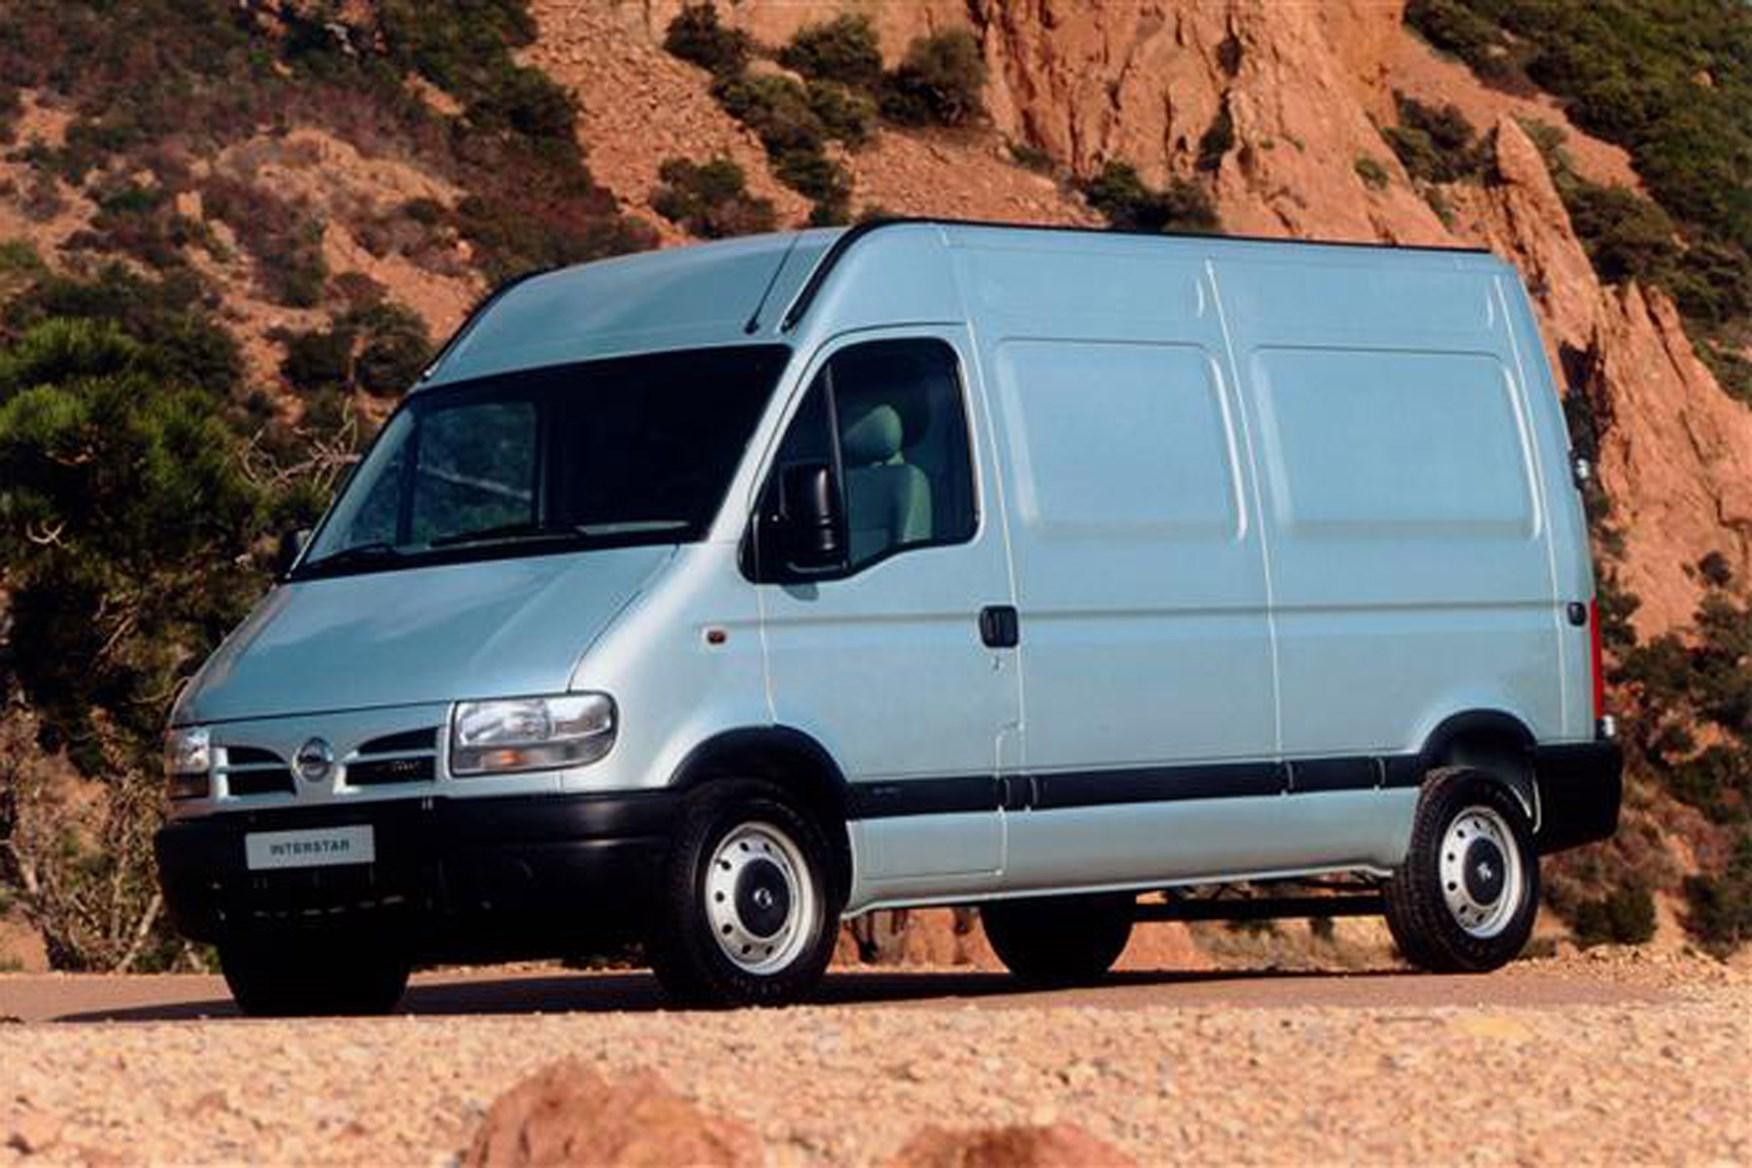 Nissan Interstar review on Parkers Vans - side exterior